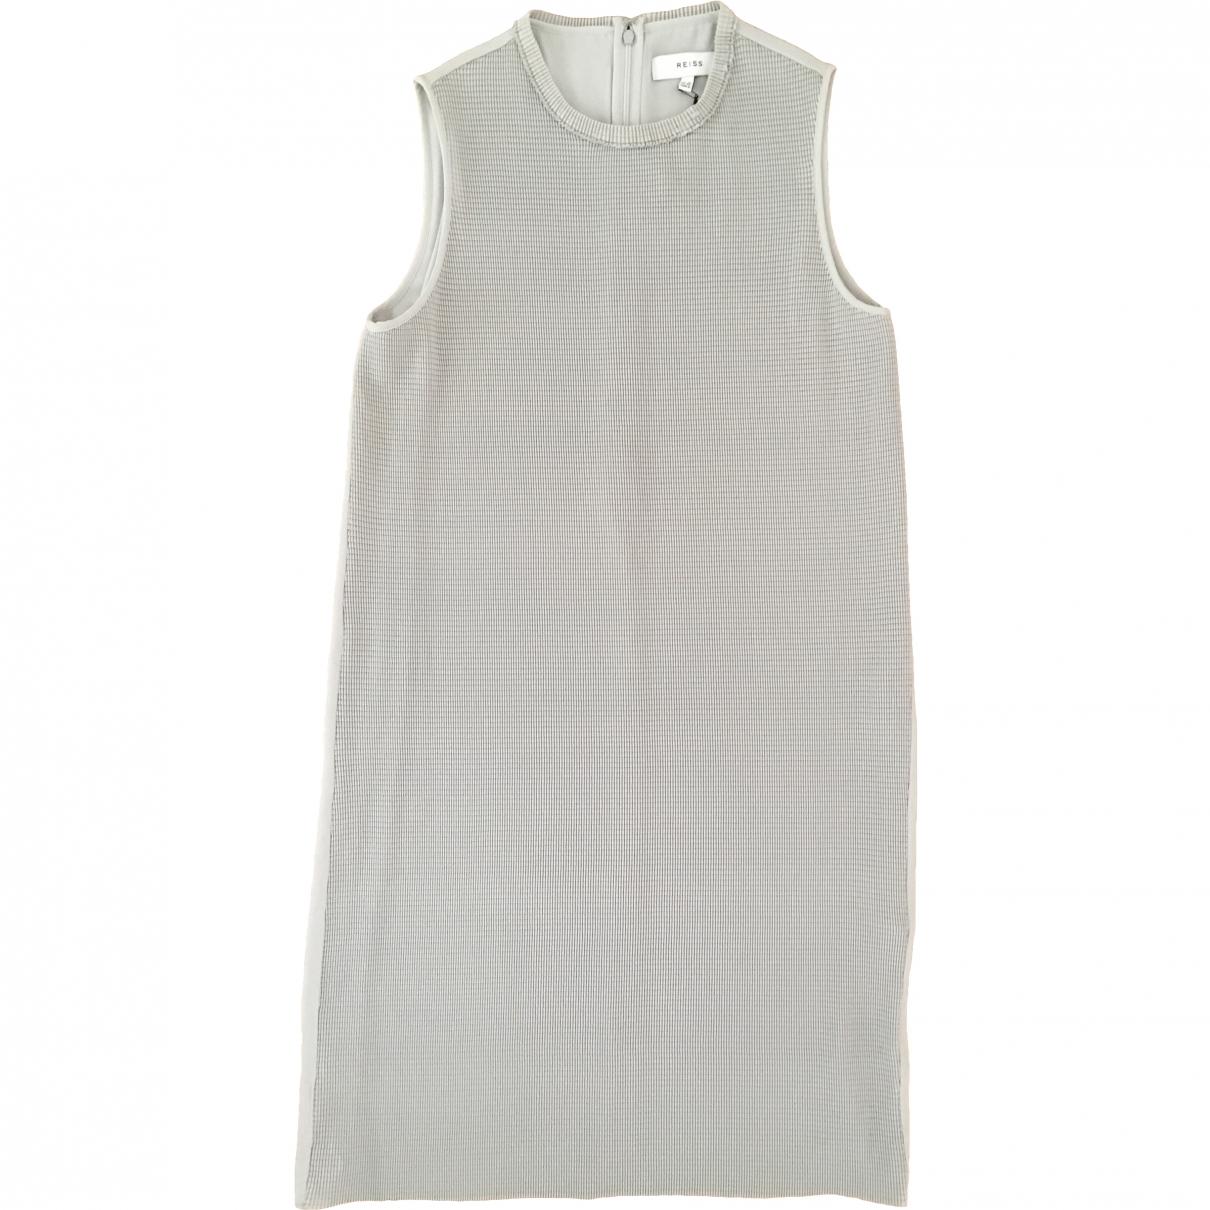 Reiss \N Grey dress for Women 10 UK